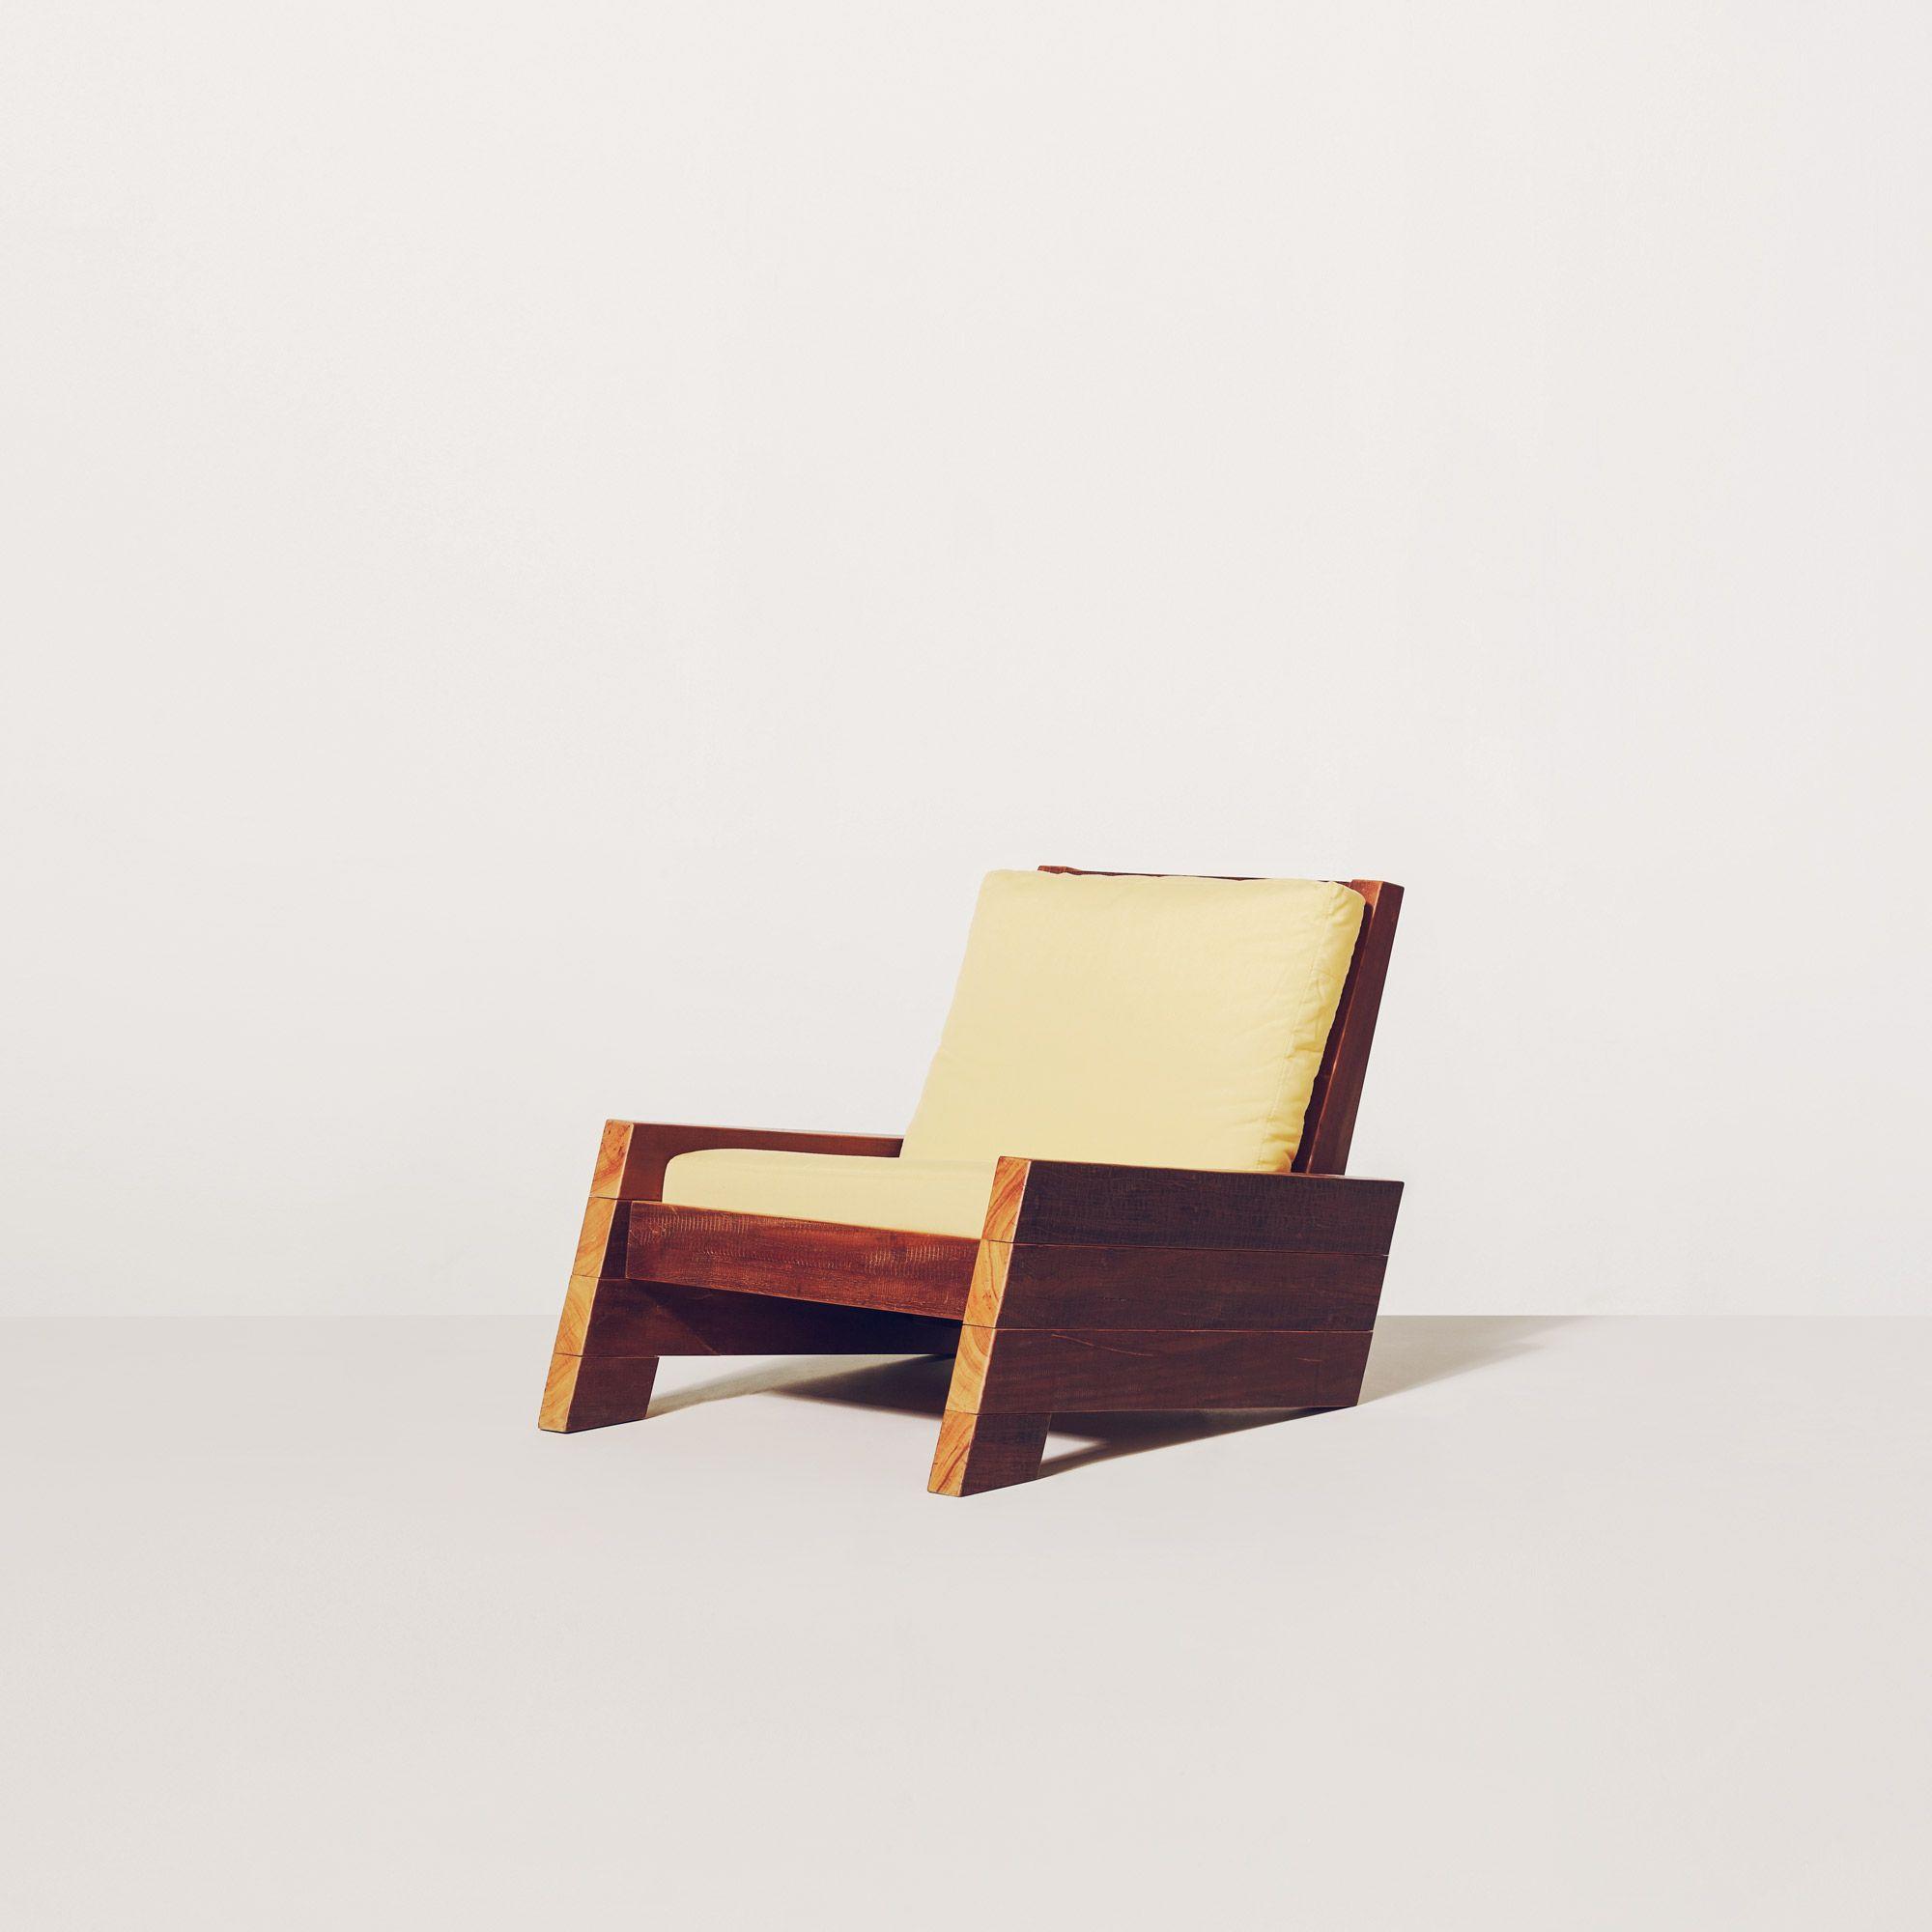 Asturias Armchair by Carlos Motta